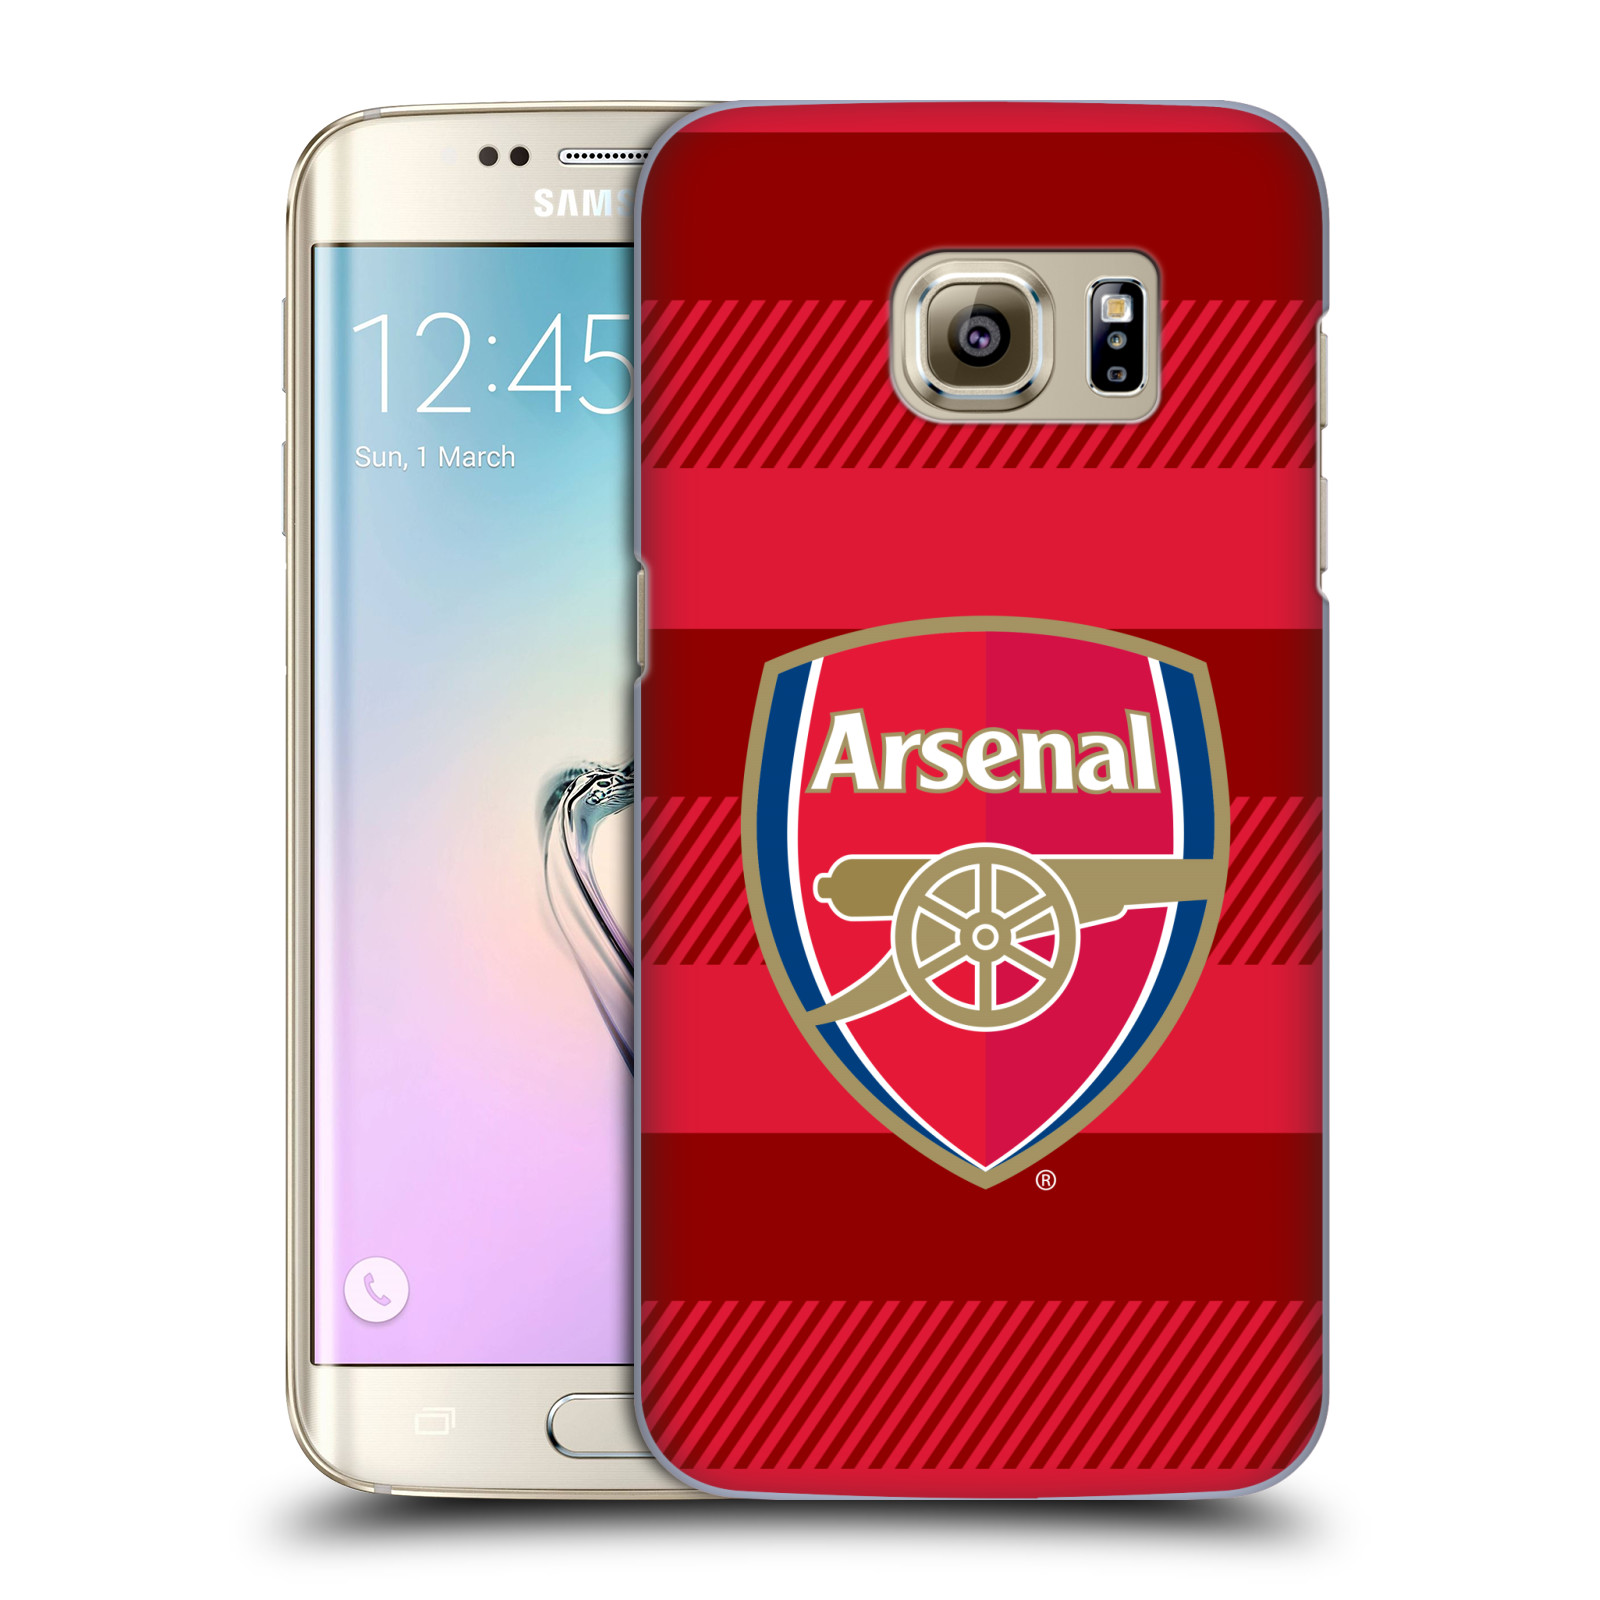 Plastové pouzdro na mobil Samsung Galaxy S7 Edge - Head Case - Arsenal FC - Logo s pruhy